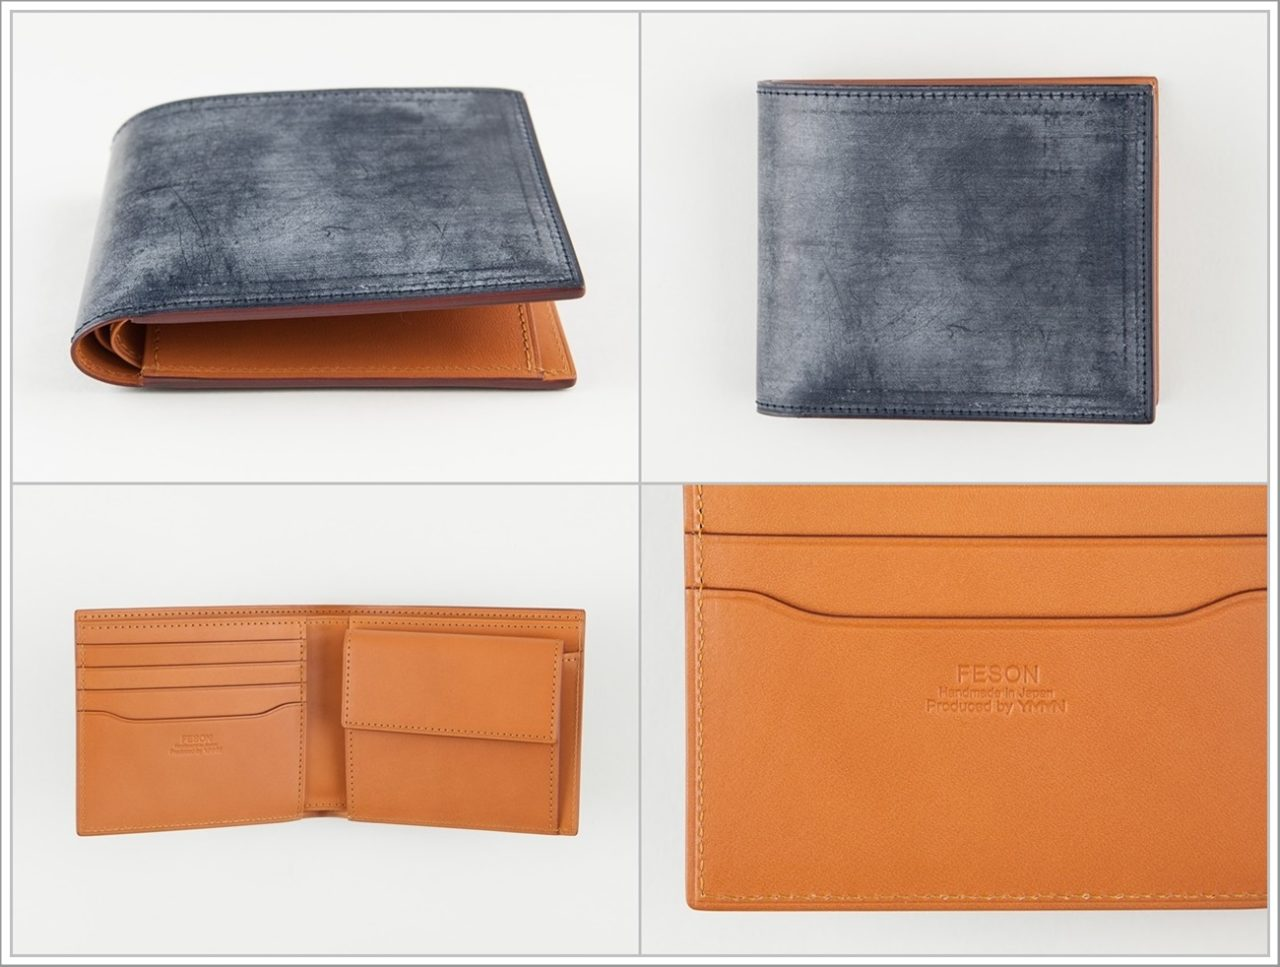 FESONのブライドルレザー二つ折り財布